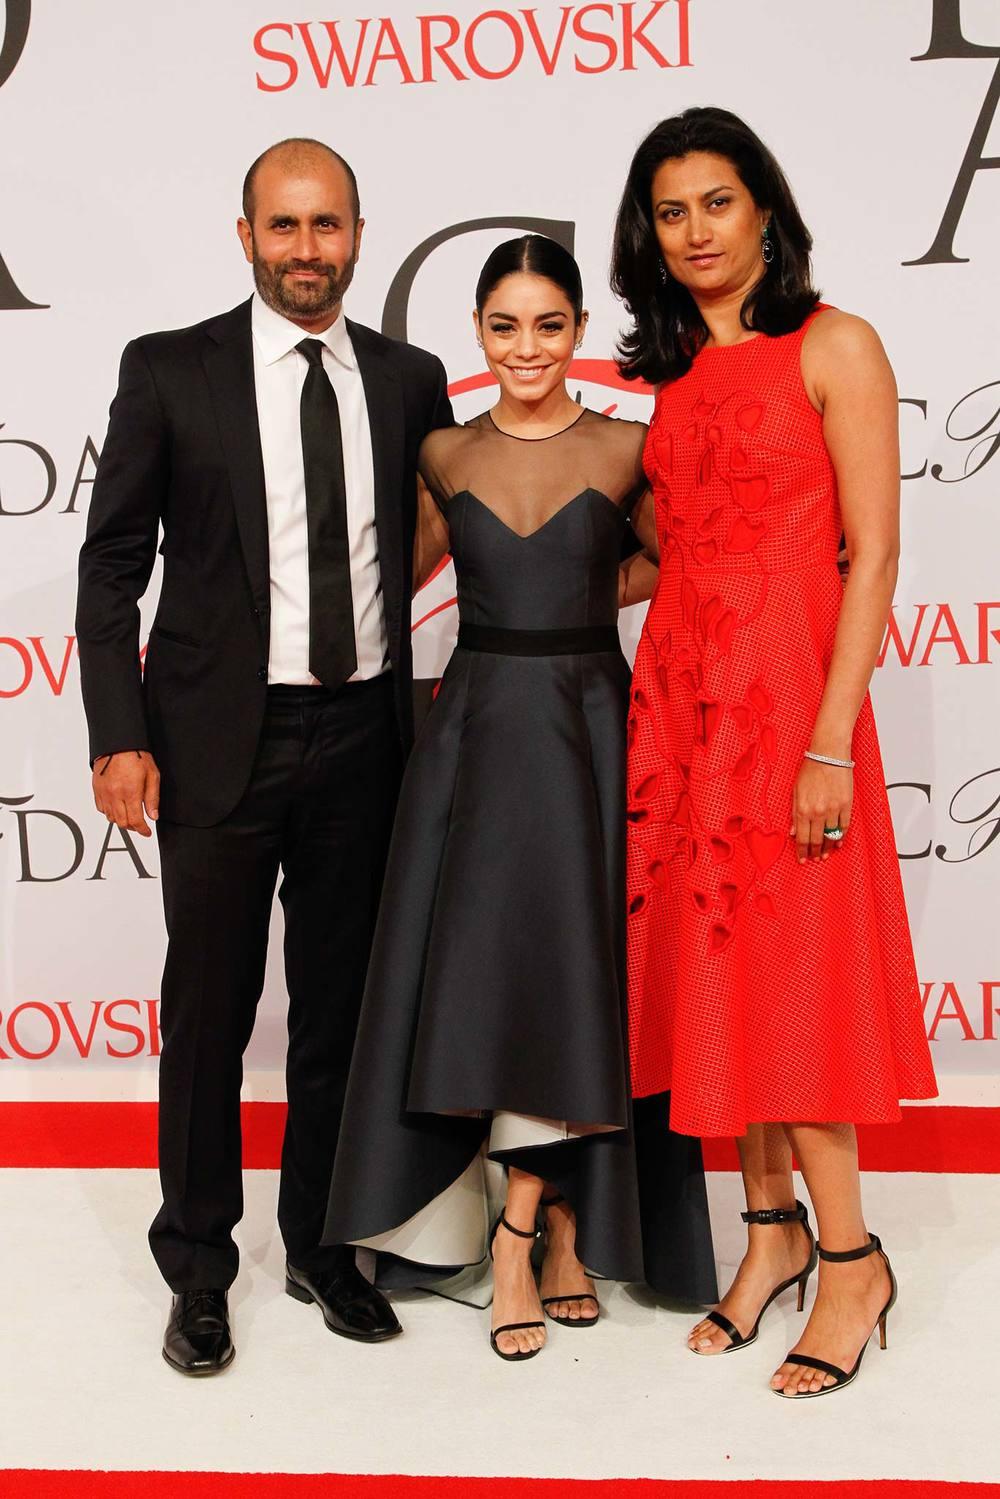 06-02-2015Vanessa Hudgens with Sachin & Babi Ahluwaliaat the 2015 CFDA Awards